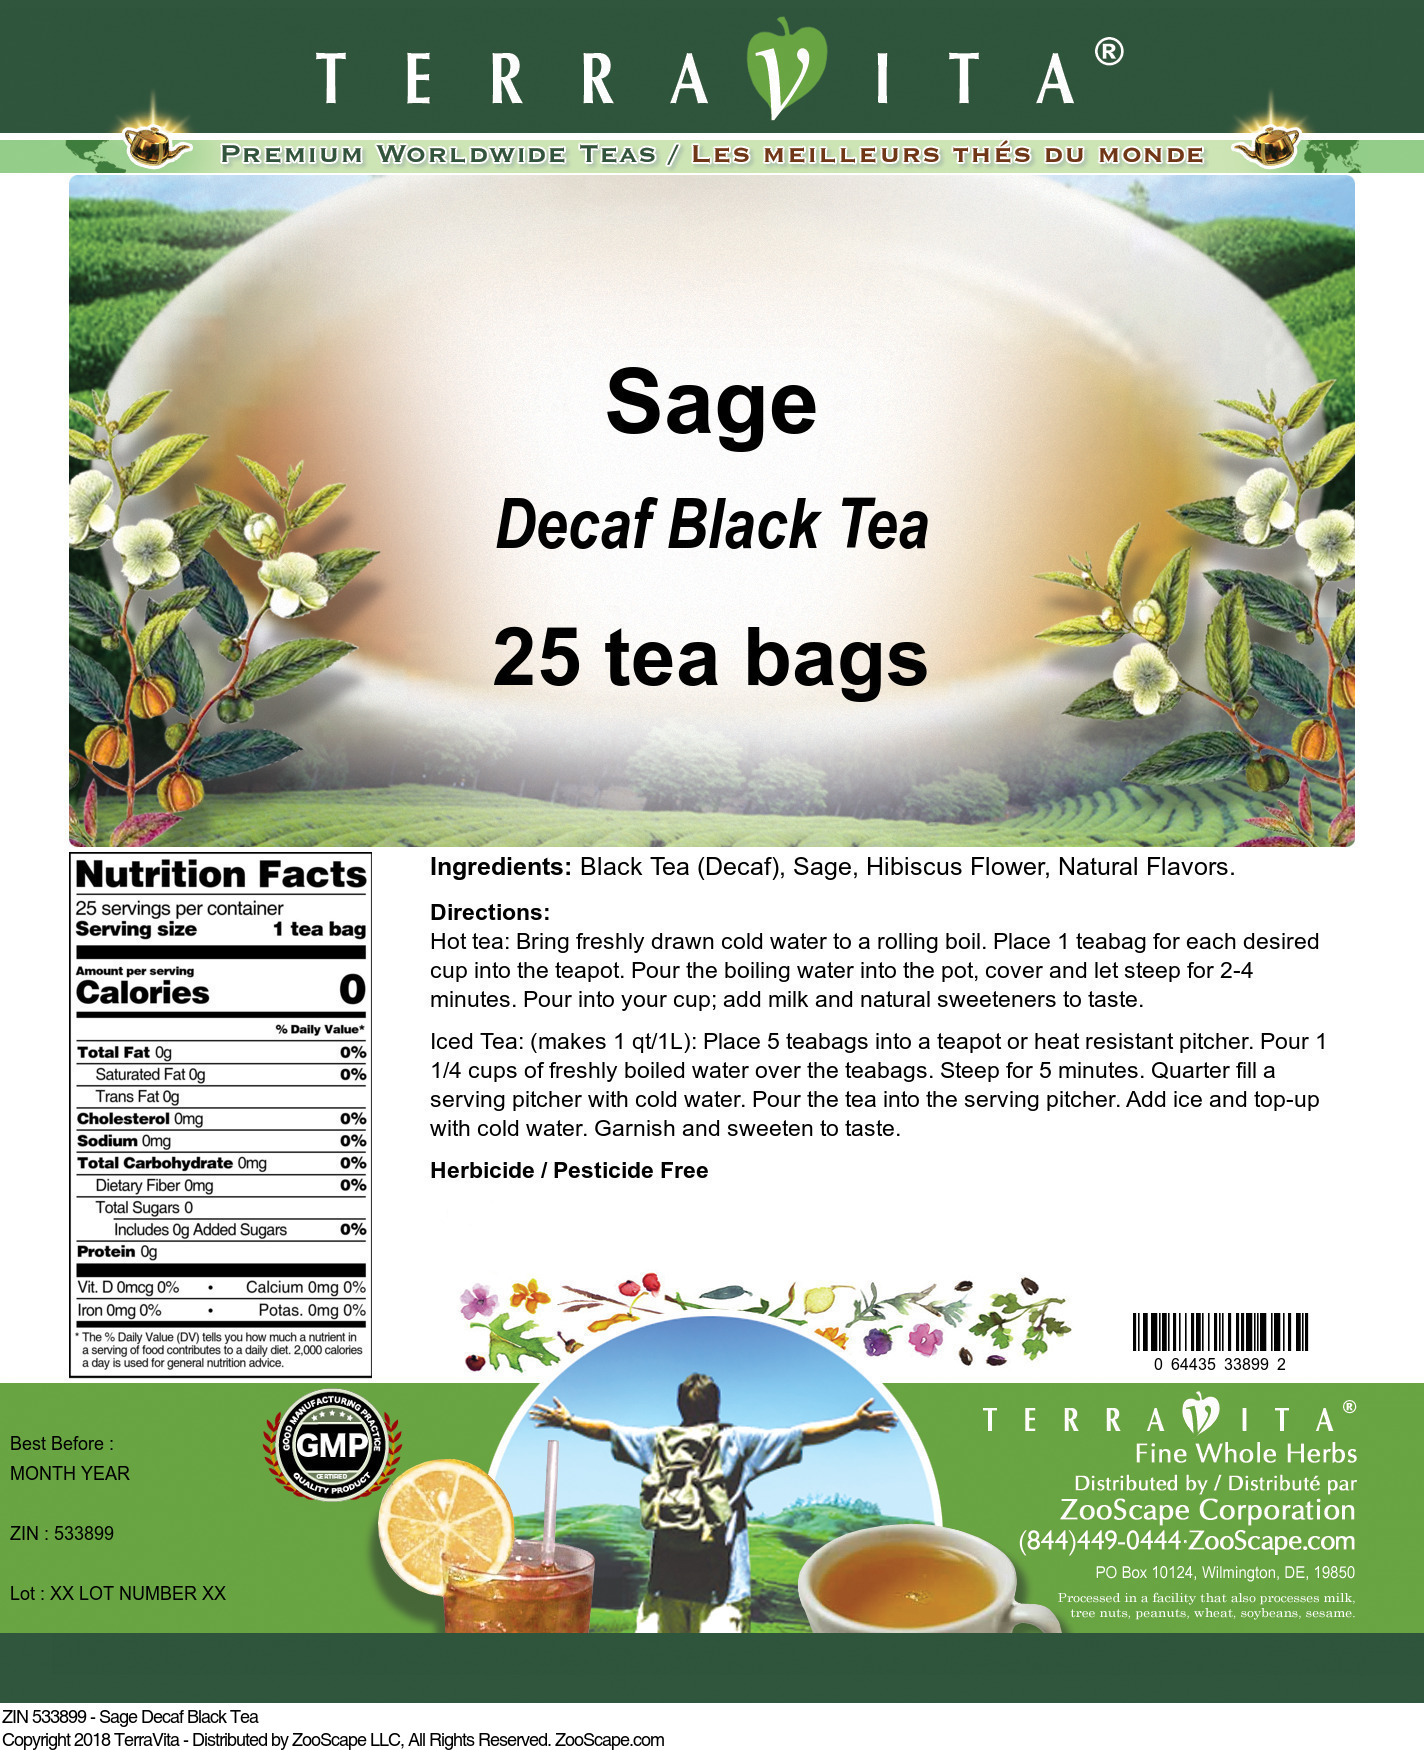 Sage Decaf Black Tea